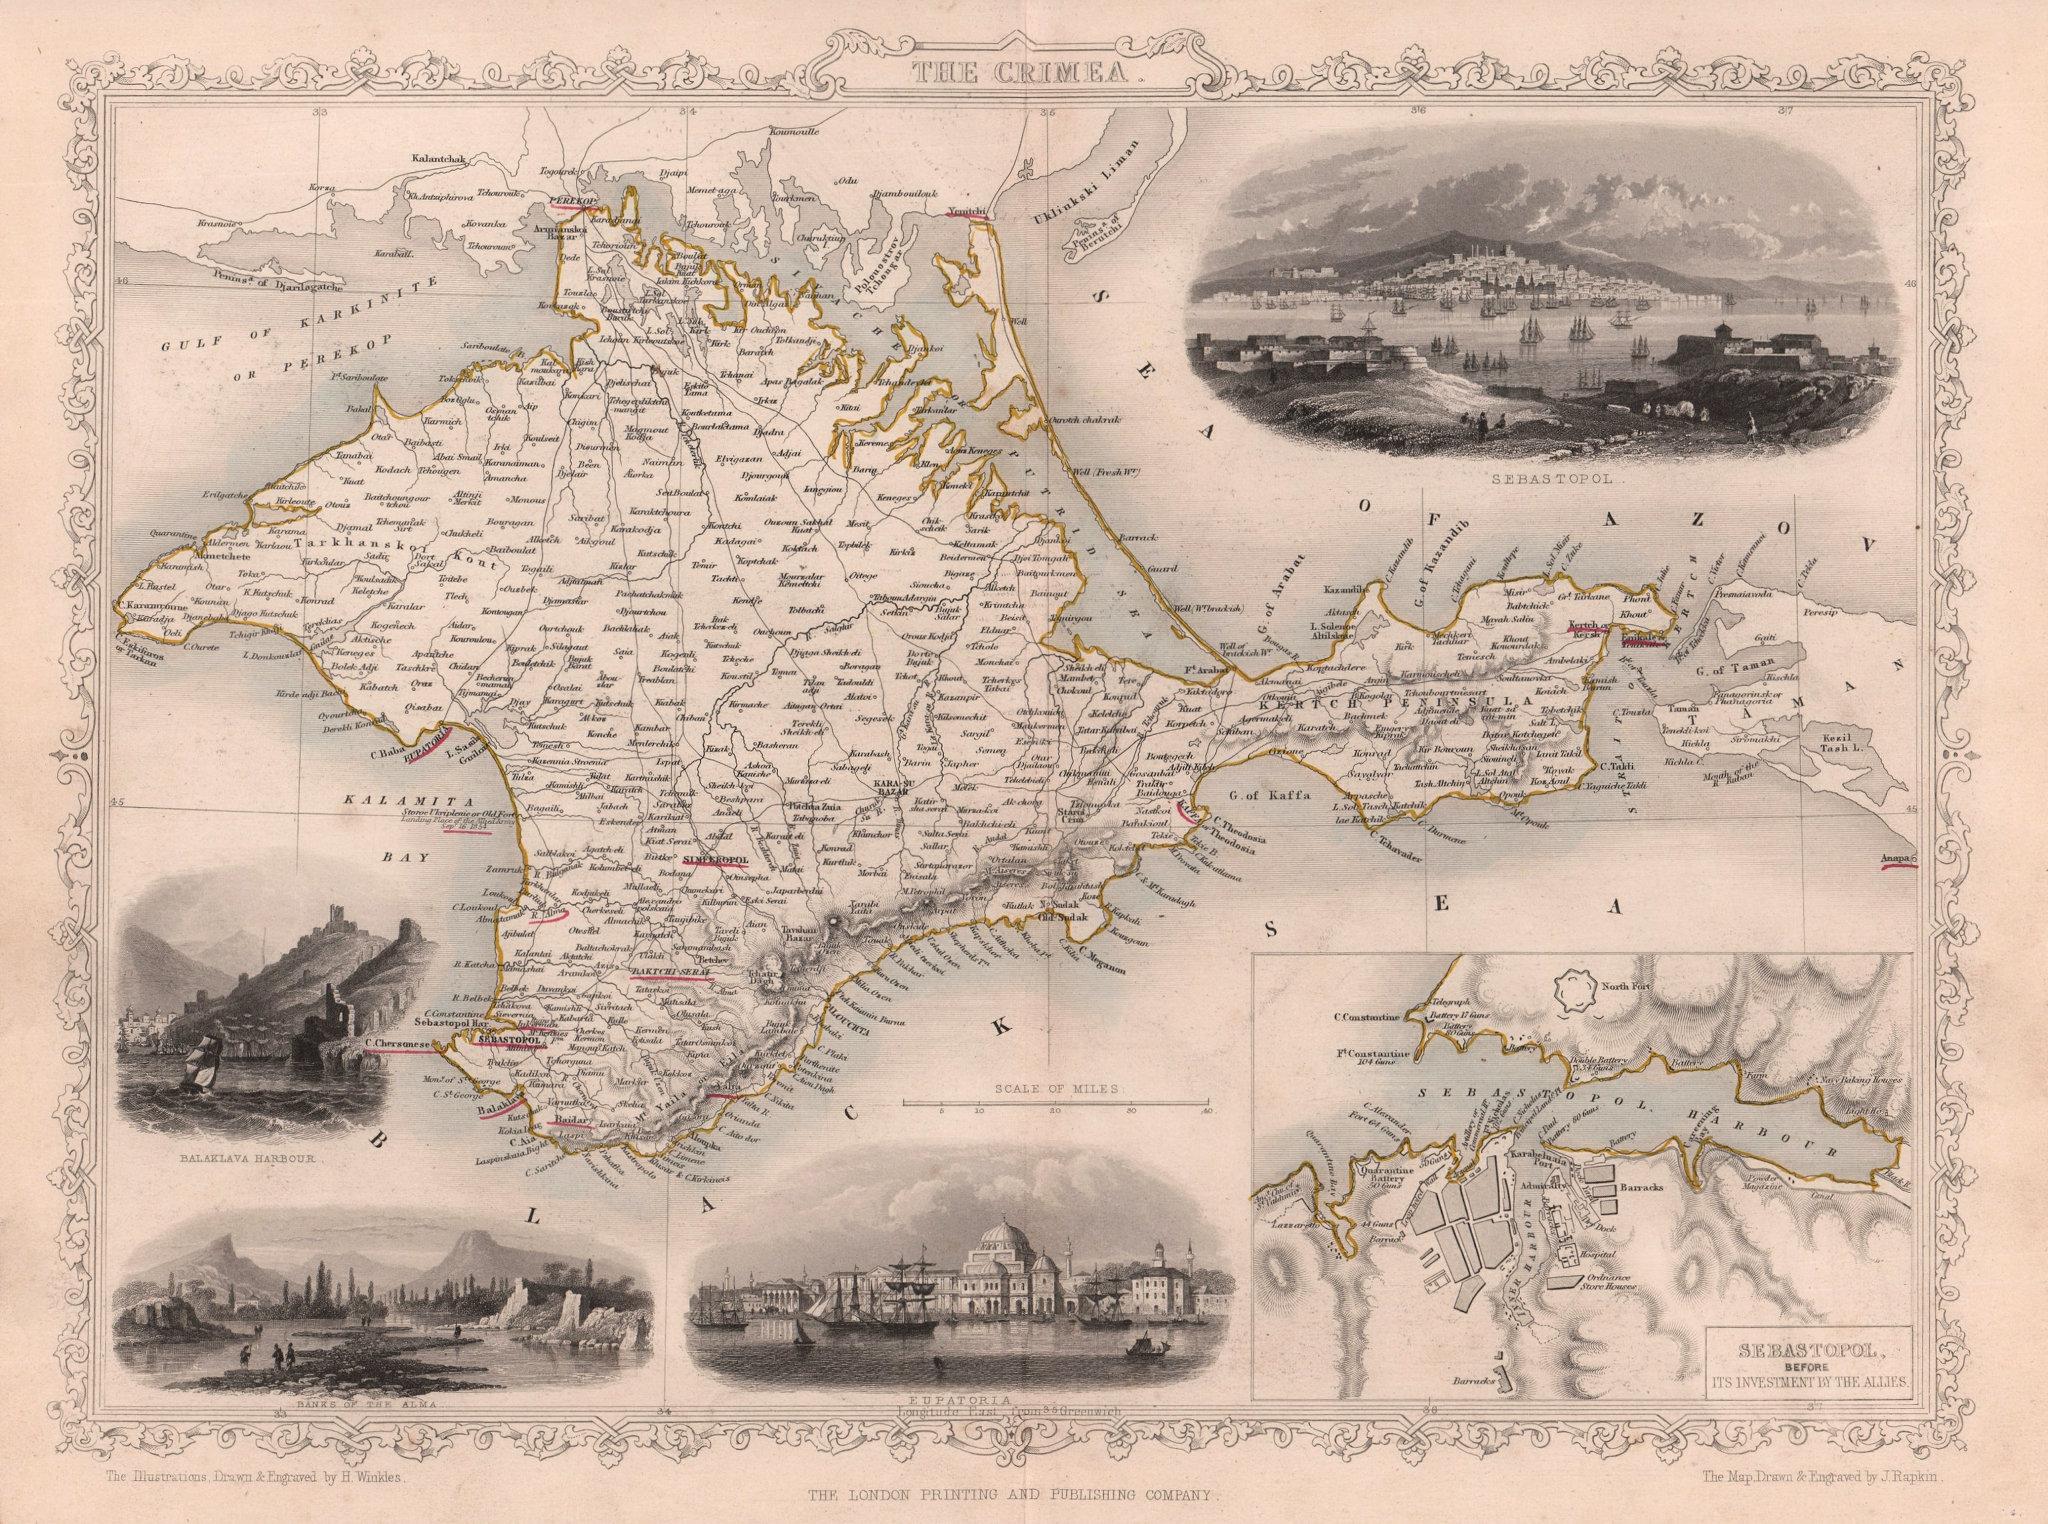 CRIMEA. Balaklava Yevpatoria vignettes. Sevastopol plan. TALLIS/RAPKIN c1855 map